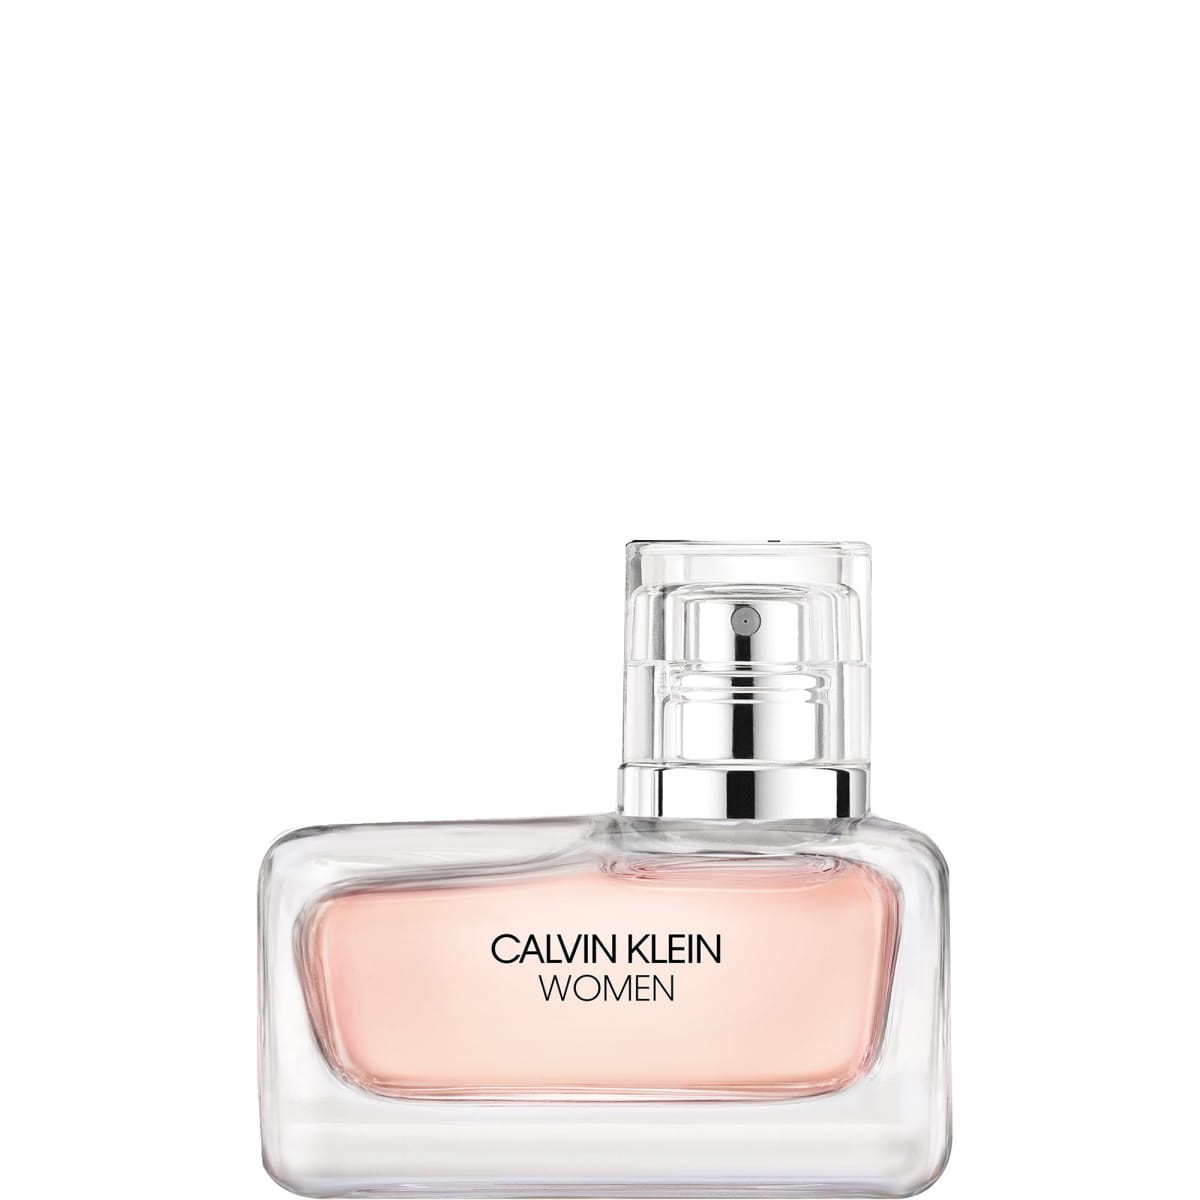 Klein Parfum Women Calvin Eau De N0nwv8Om